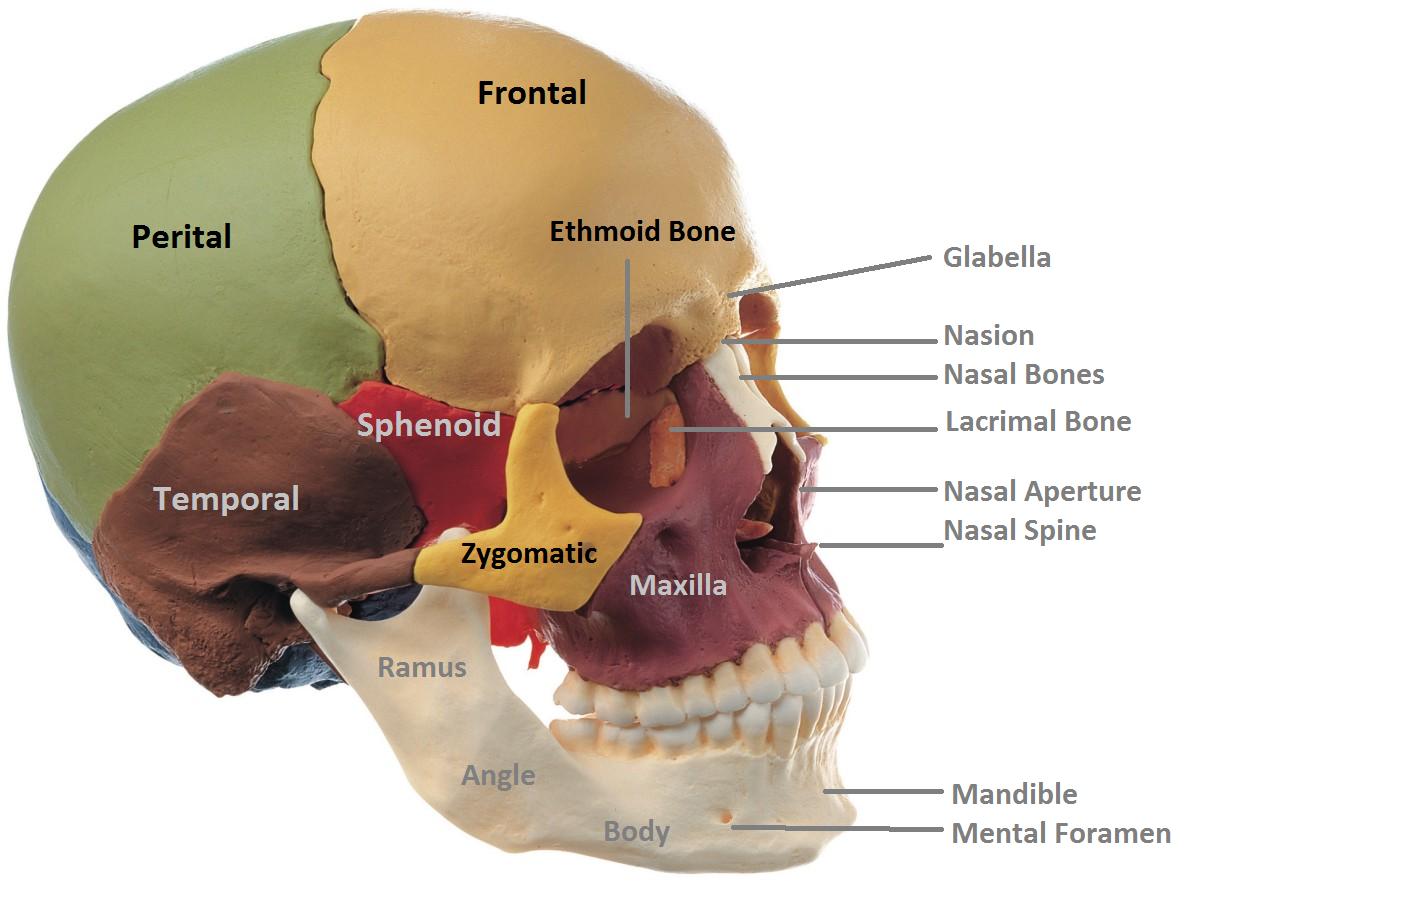 Anatomy Made Easy Anterior View Of Skull